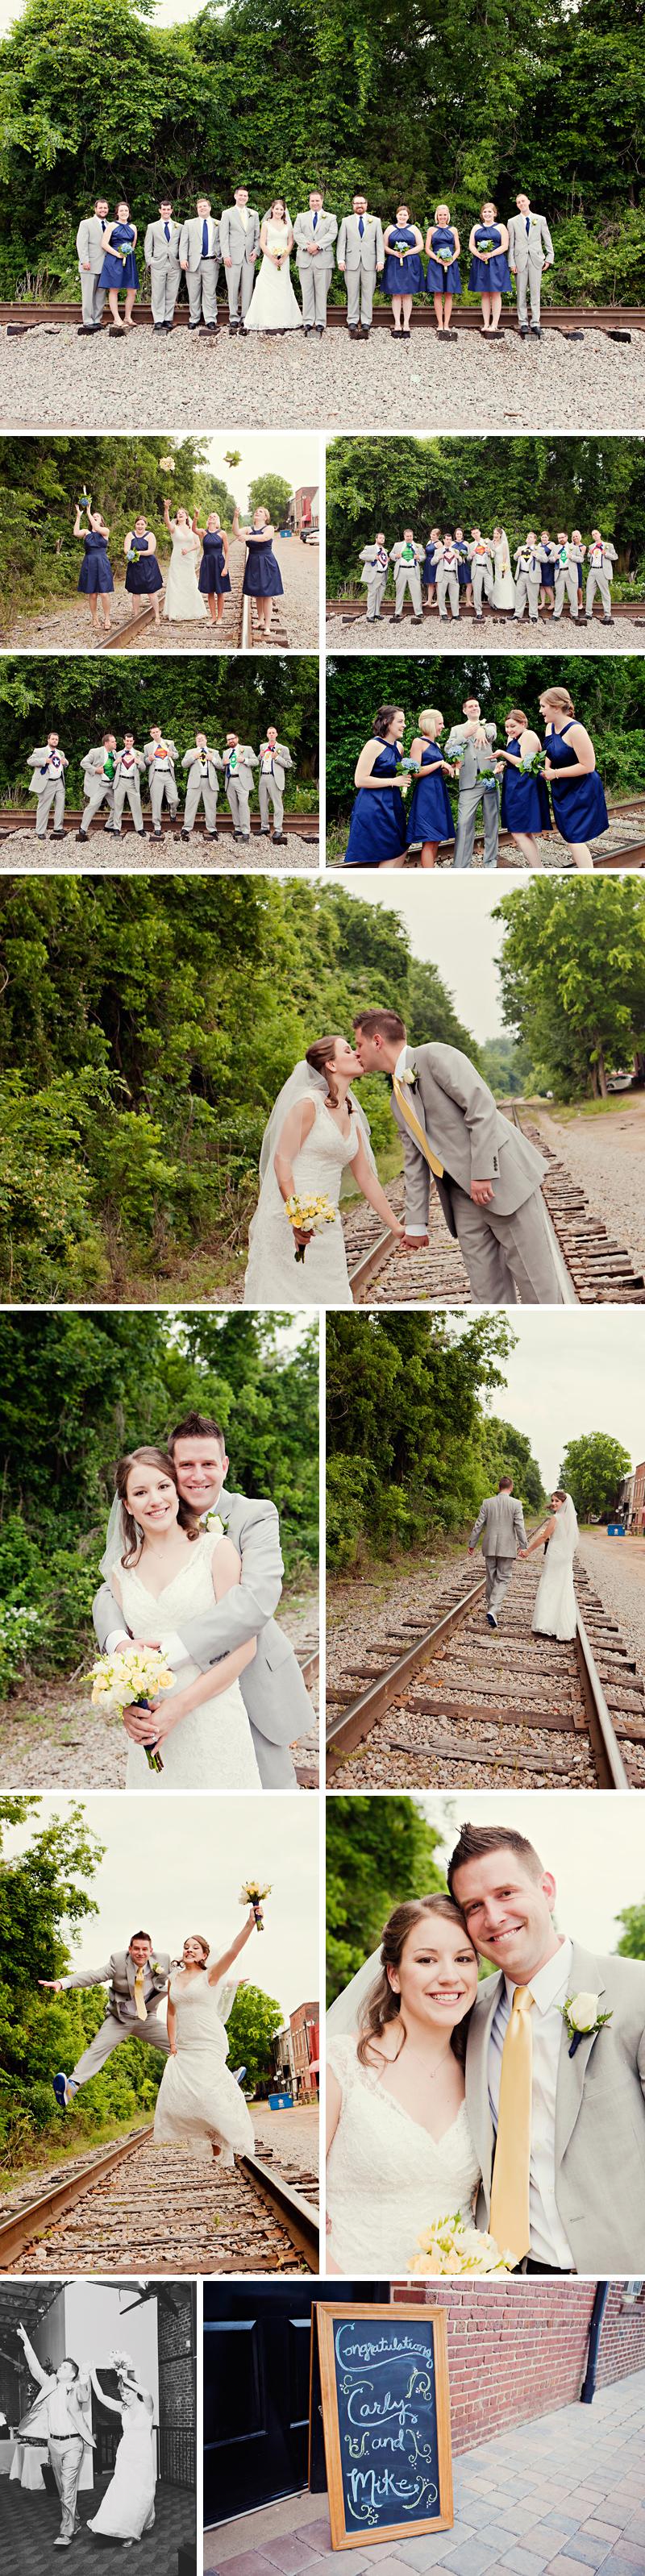 Raleigh-Wedding-Photographerc007